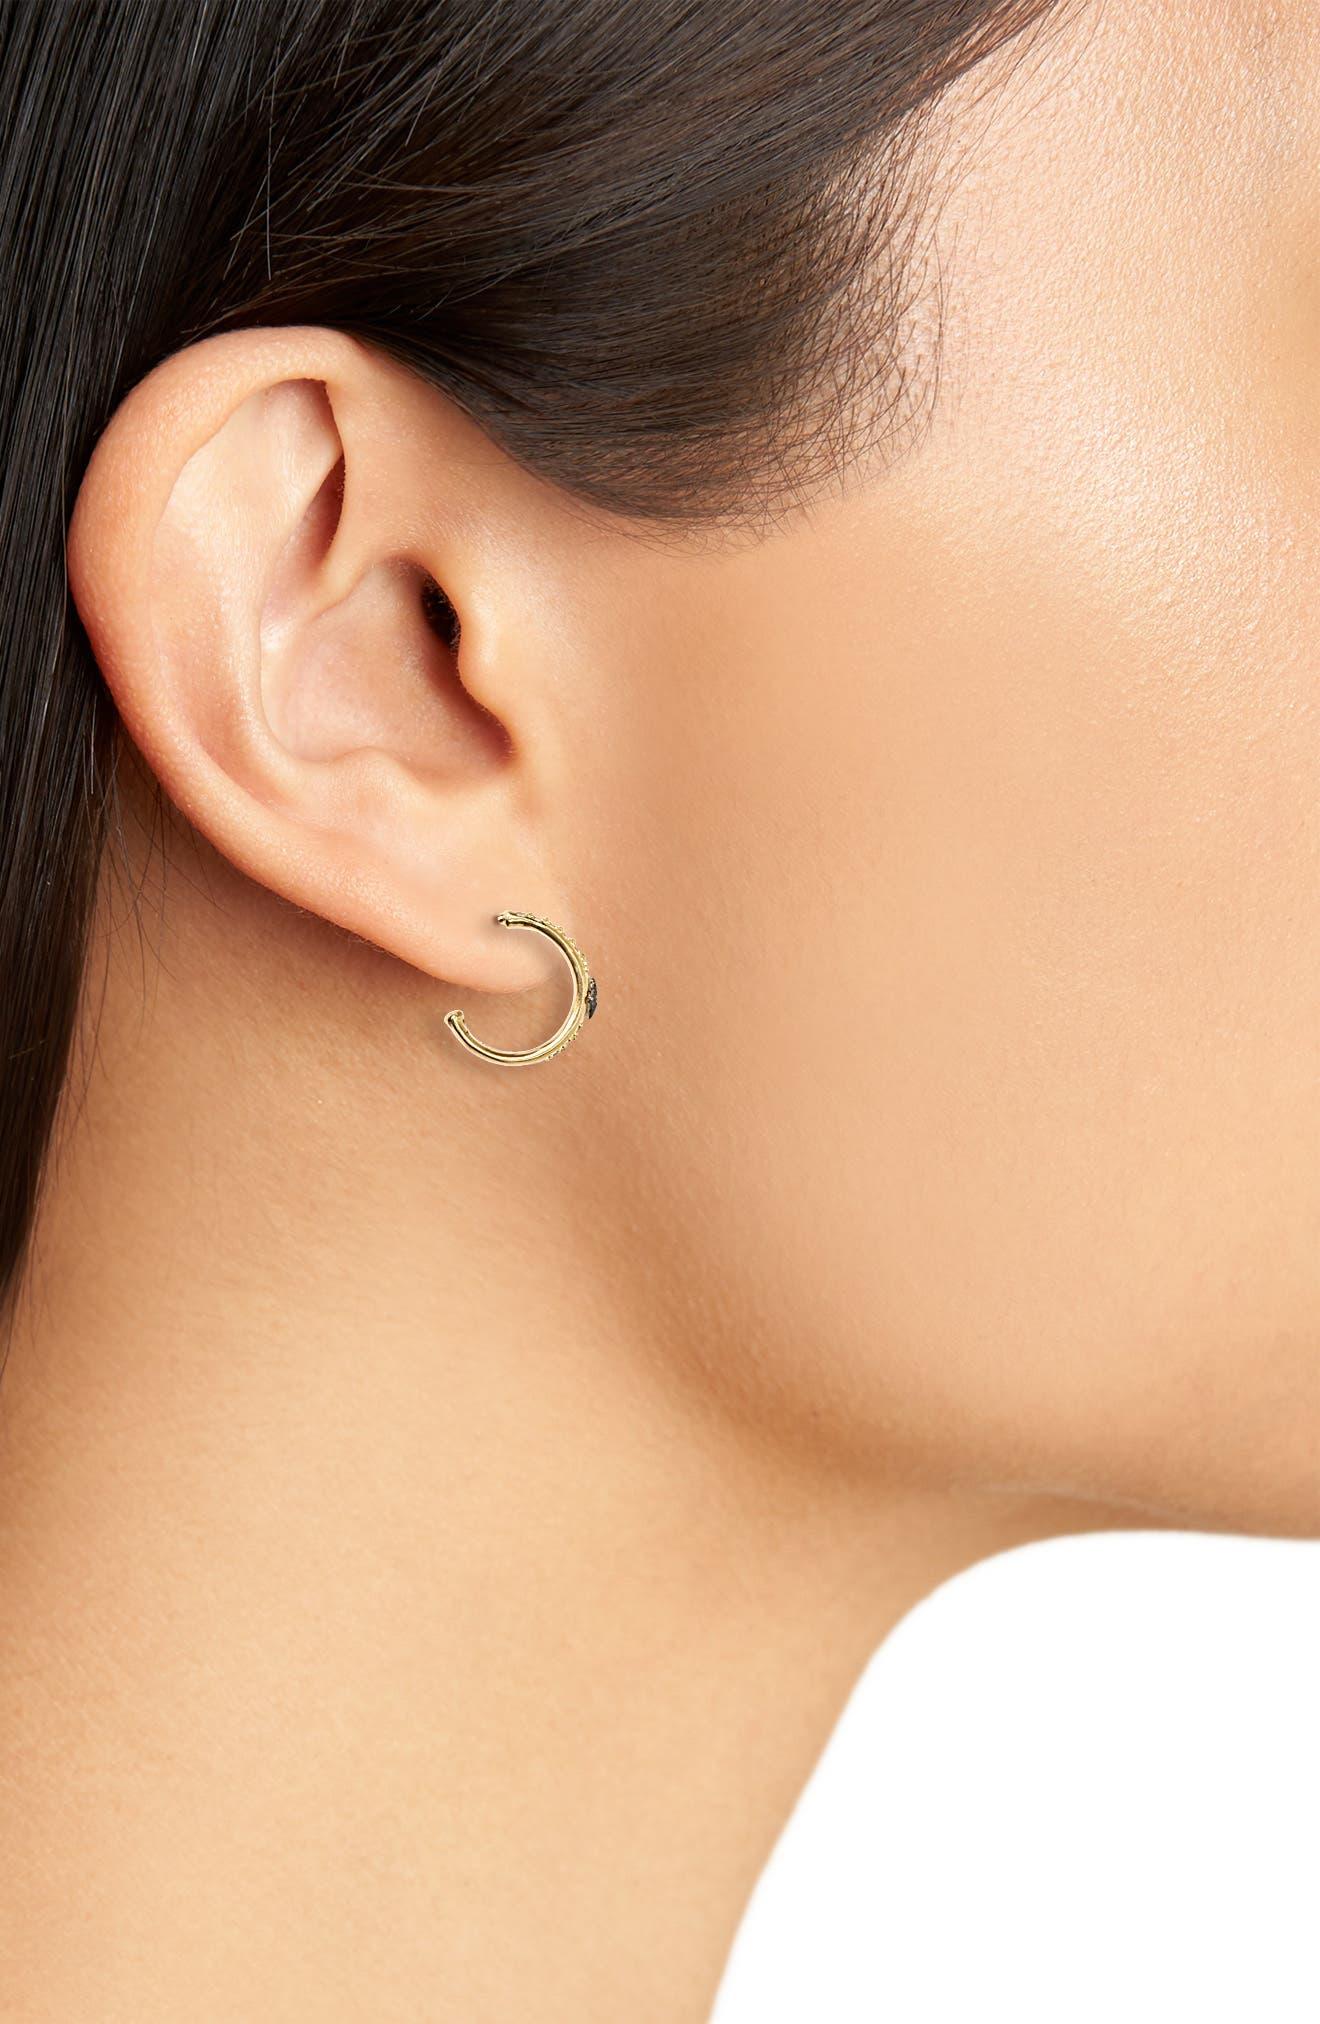 Old World Crivelli Earrings,                             Alternate thumbnail 2, color,                             BLACKENED SILVER/ GOLD